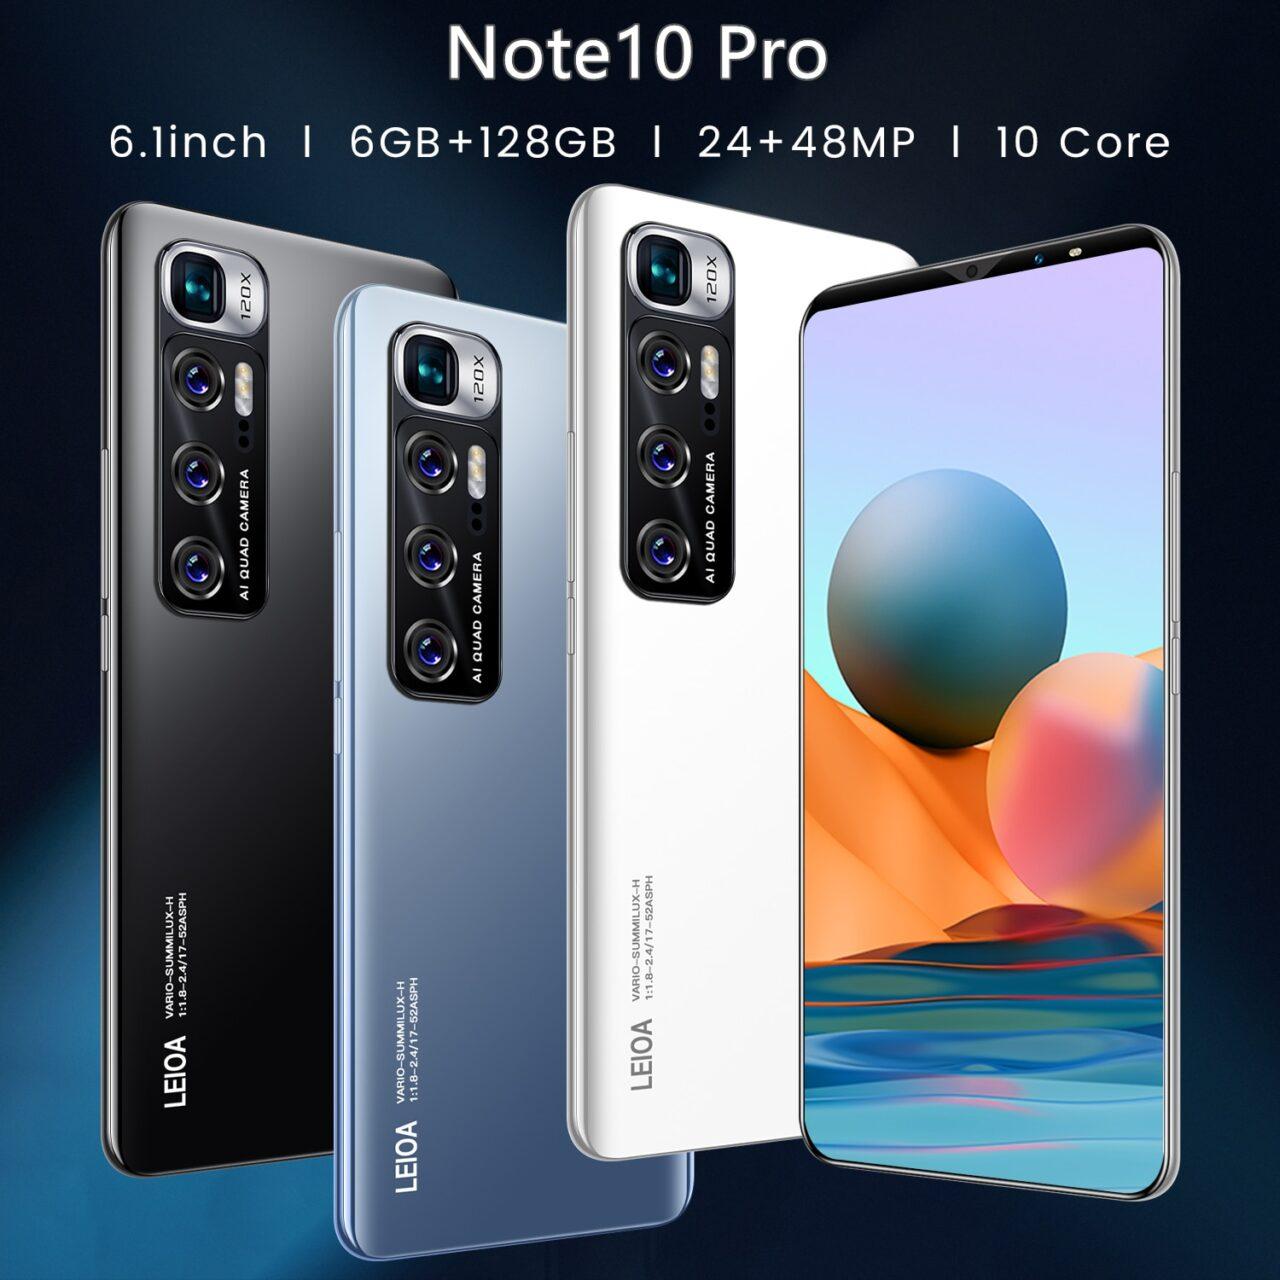 Note10 Pro